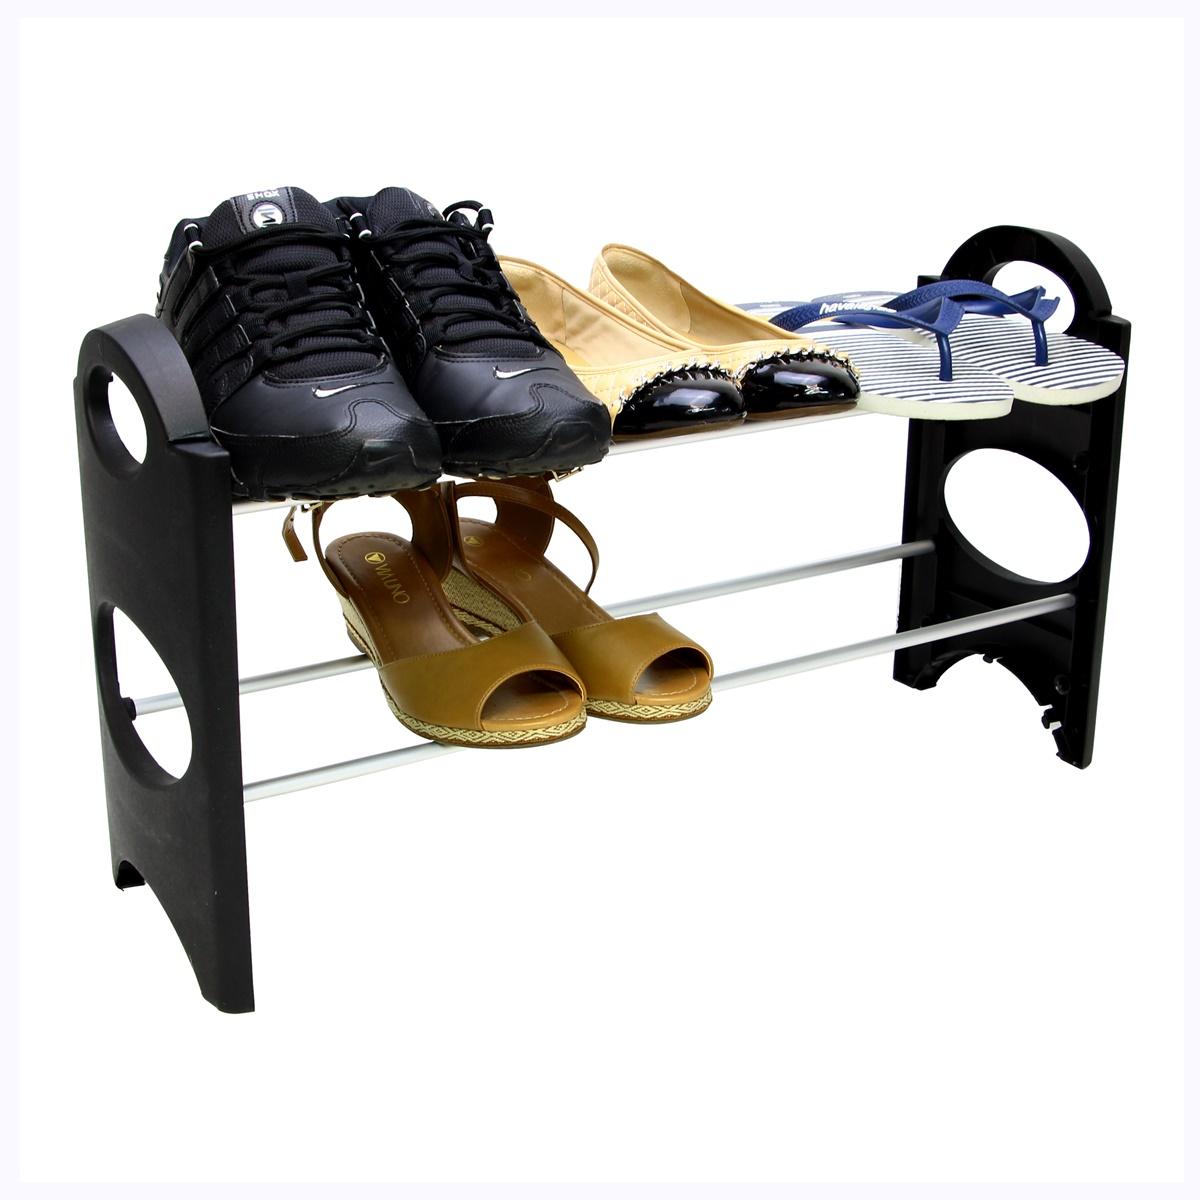 Sapateira Pequena Para Hall De Entrada Porta varias cores 12 Sapatos SAP-2A-6P-R